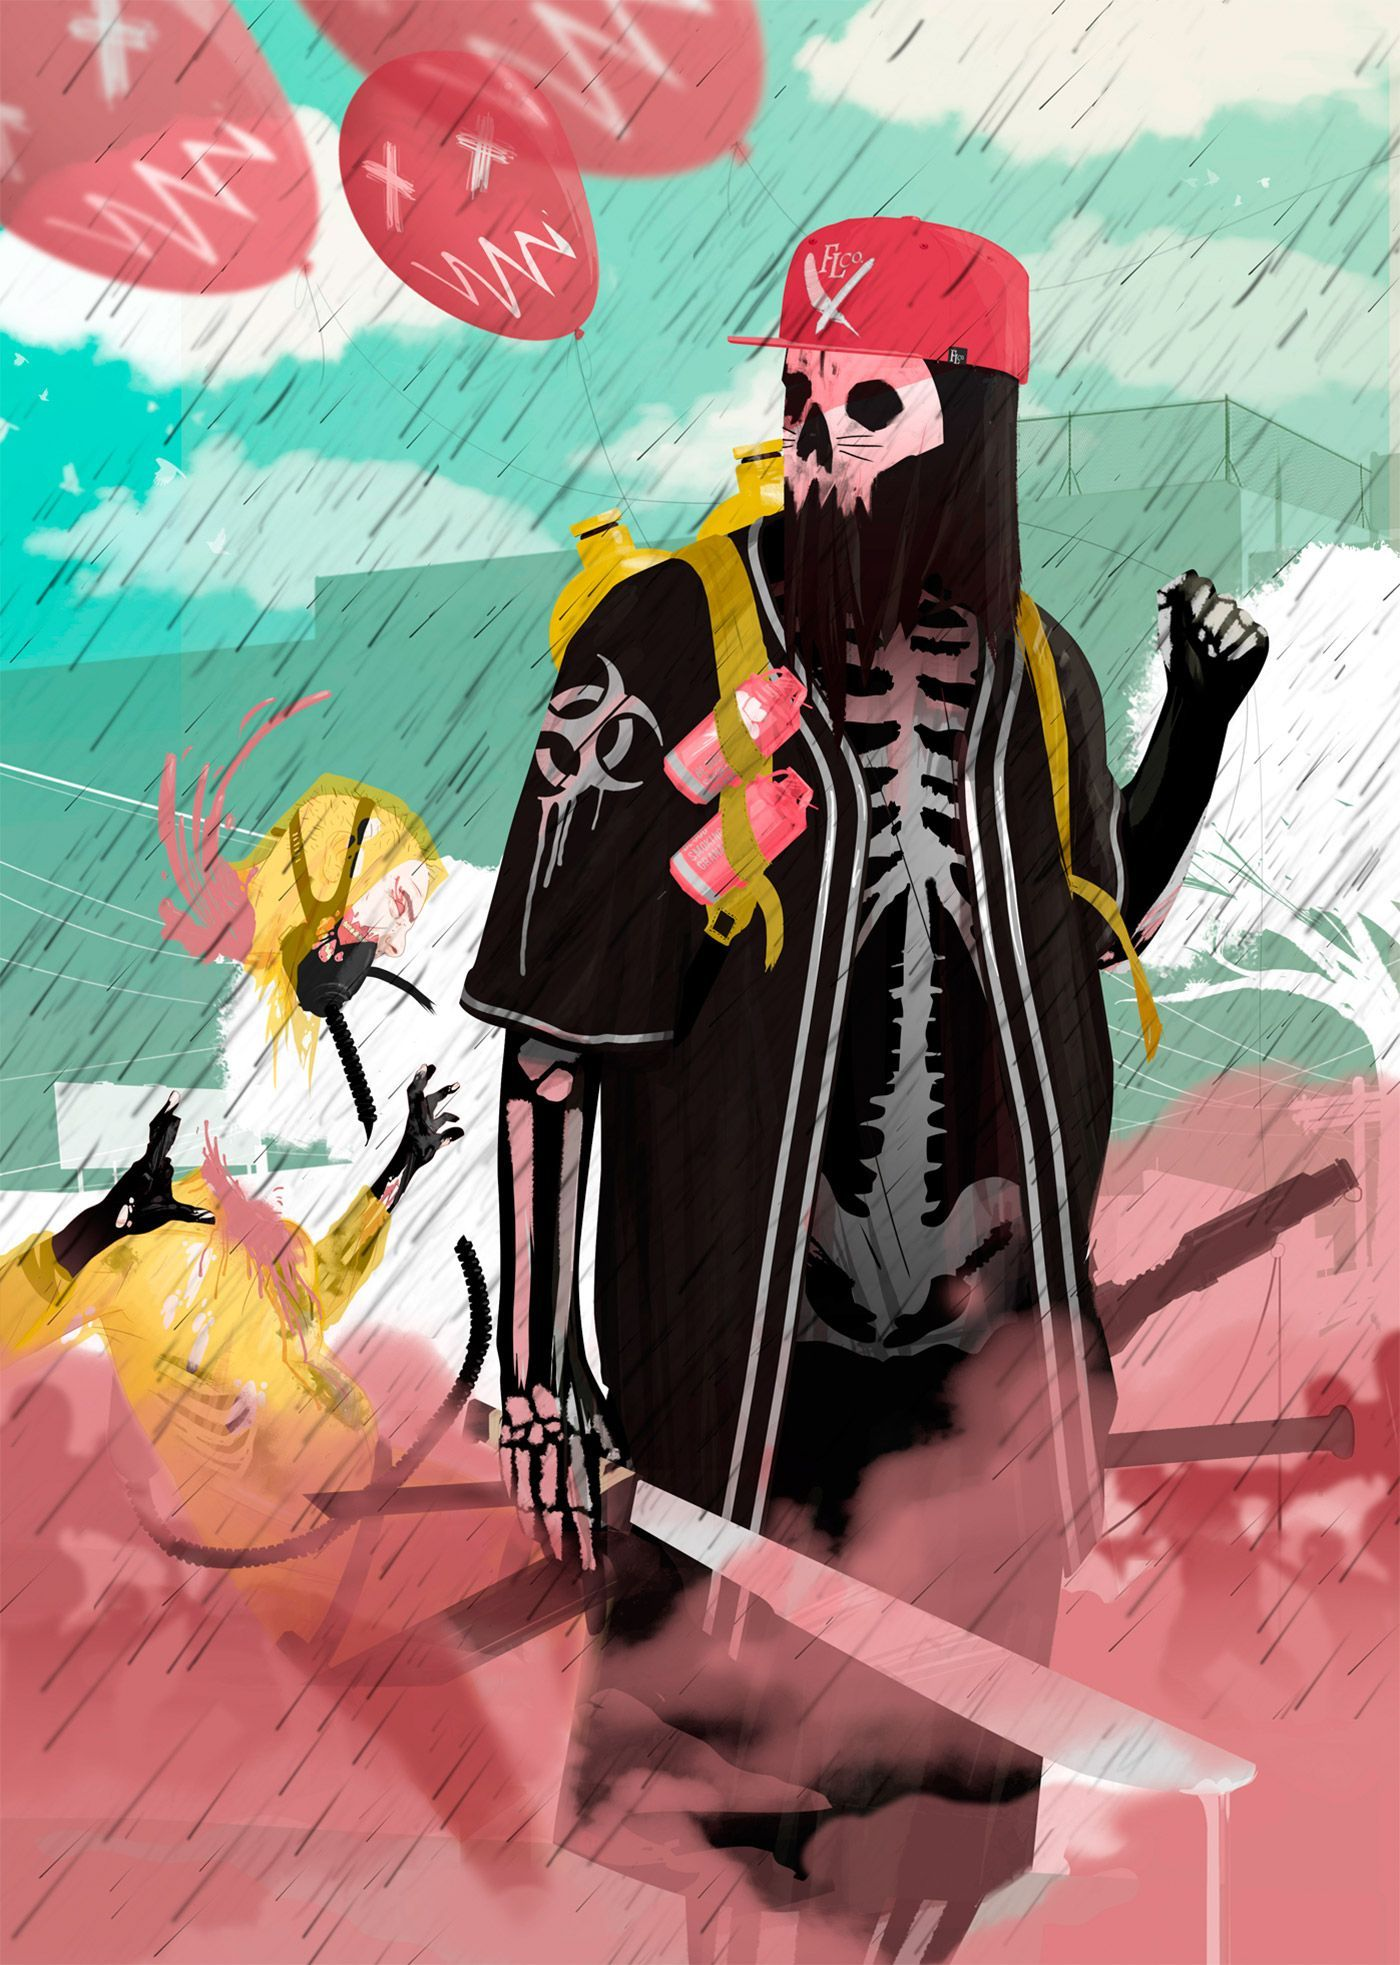 New Illustrations By Daniel Caballero